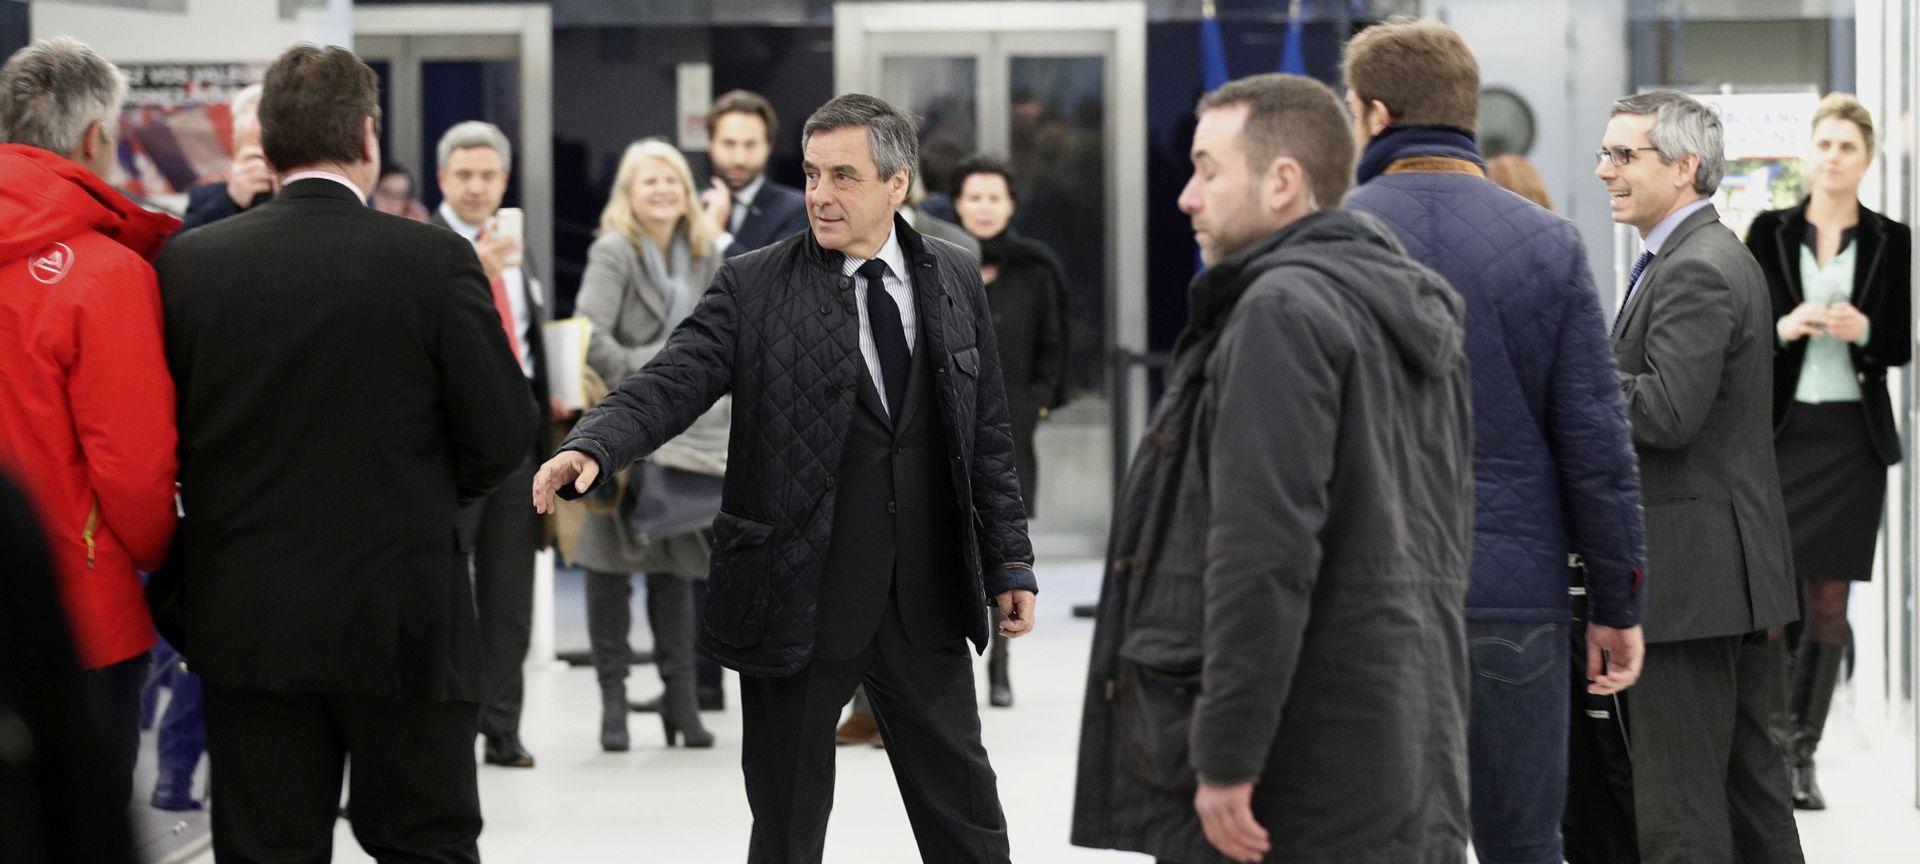 'PENELOPEGATE' Protiv Fillona i službeno pokrenuta istraga